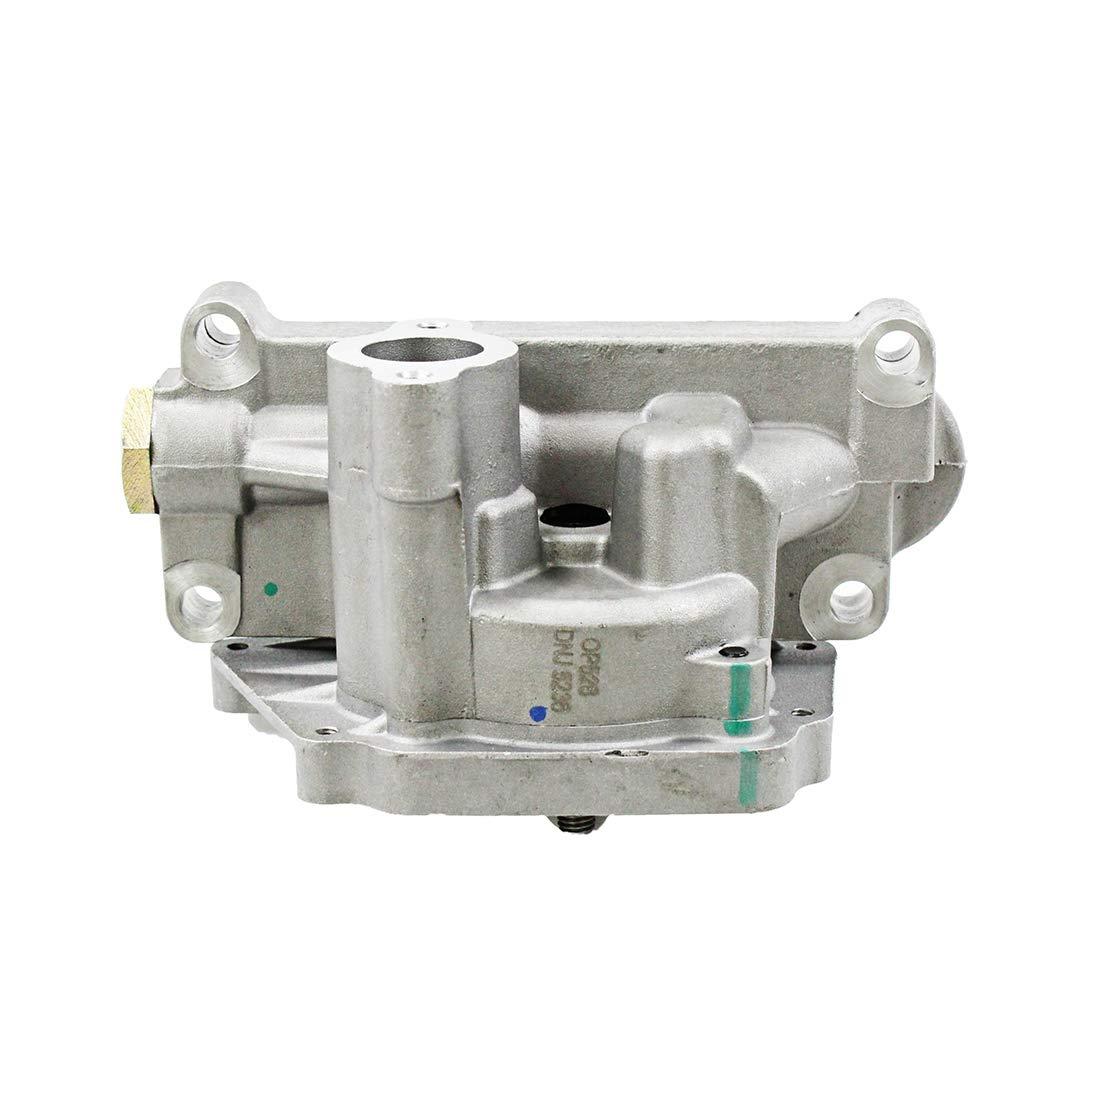 DNJ Engine Components OIL PUMPS OP528